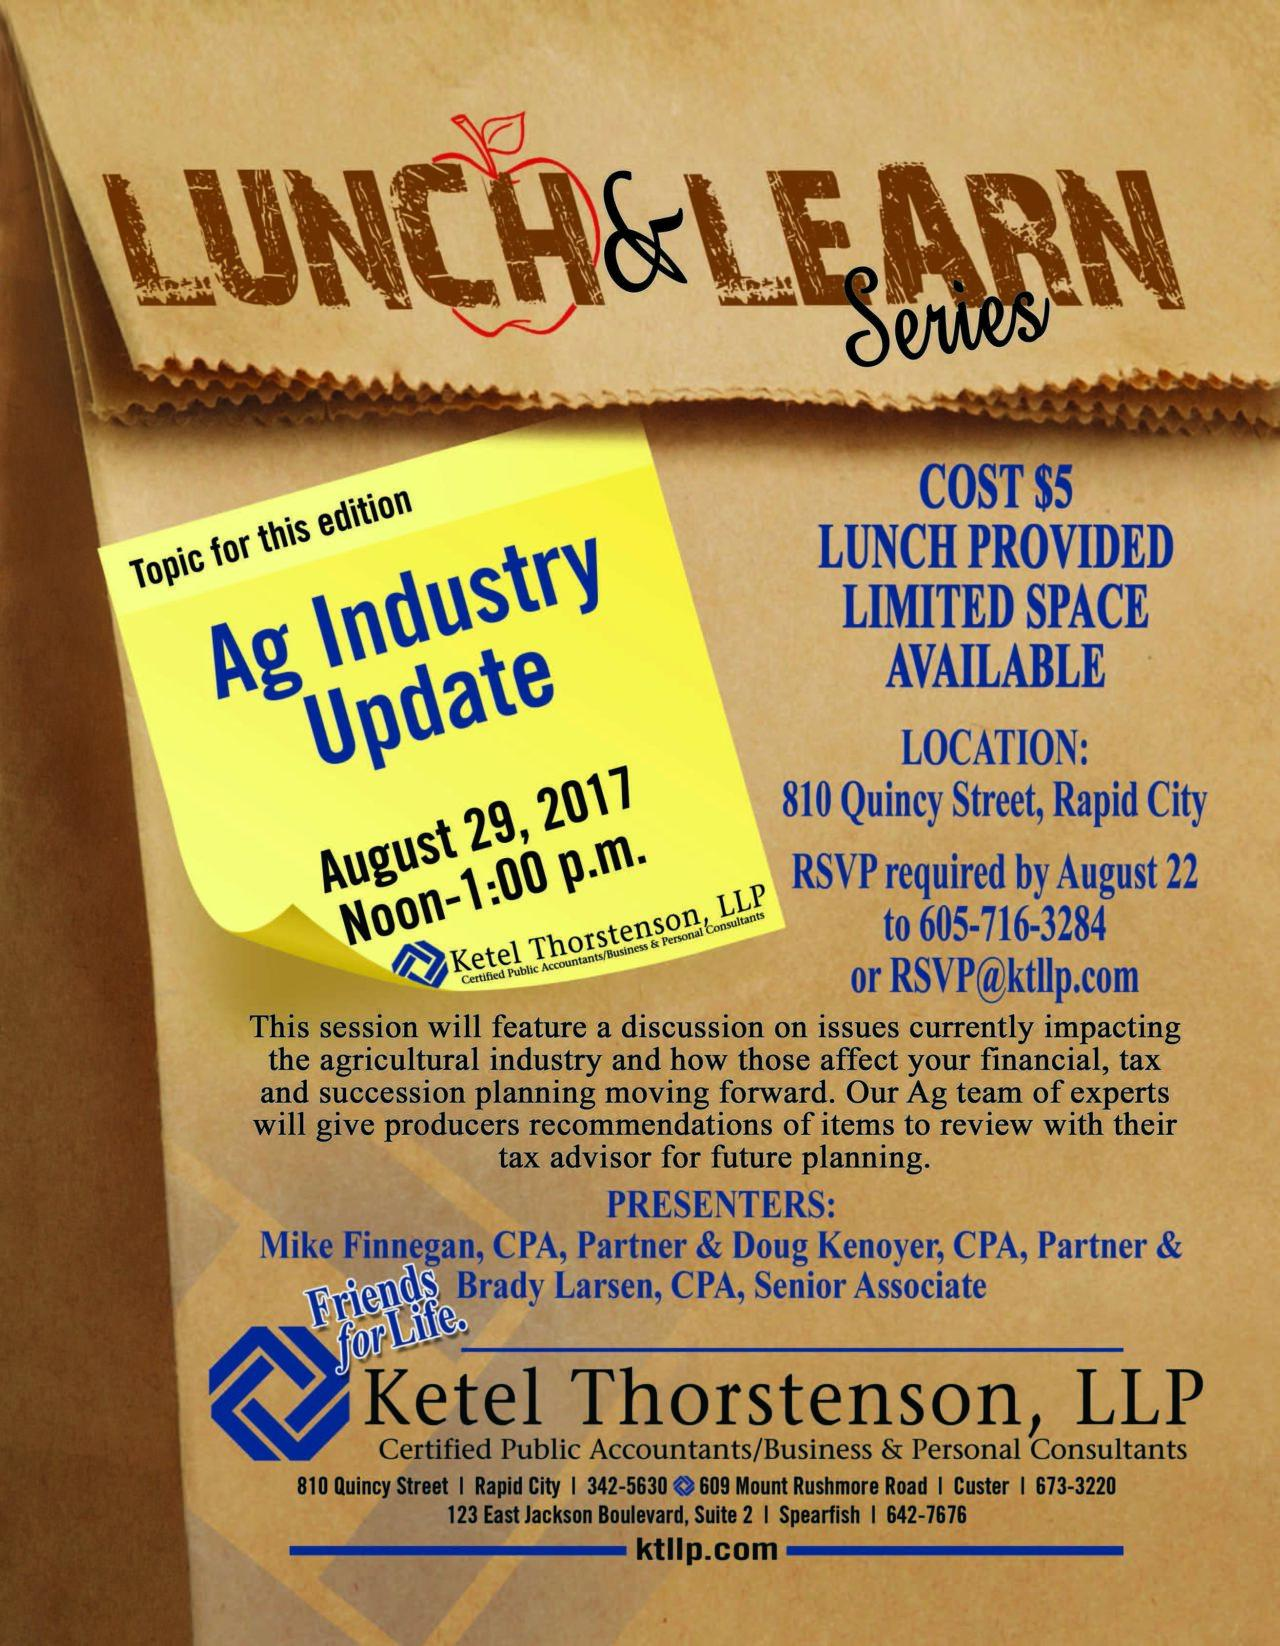 Ketel_Lunch-Learn-Series_August29-1280x1646.jpg